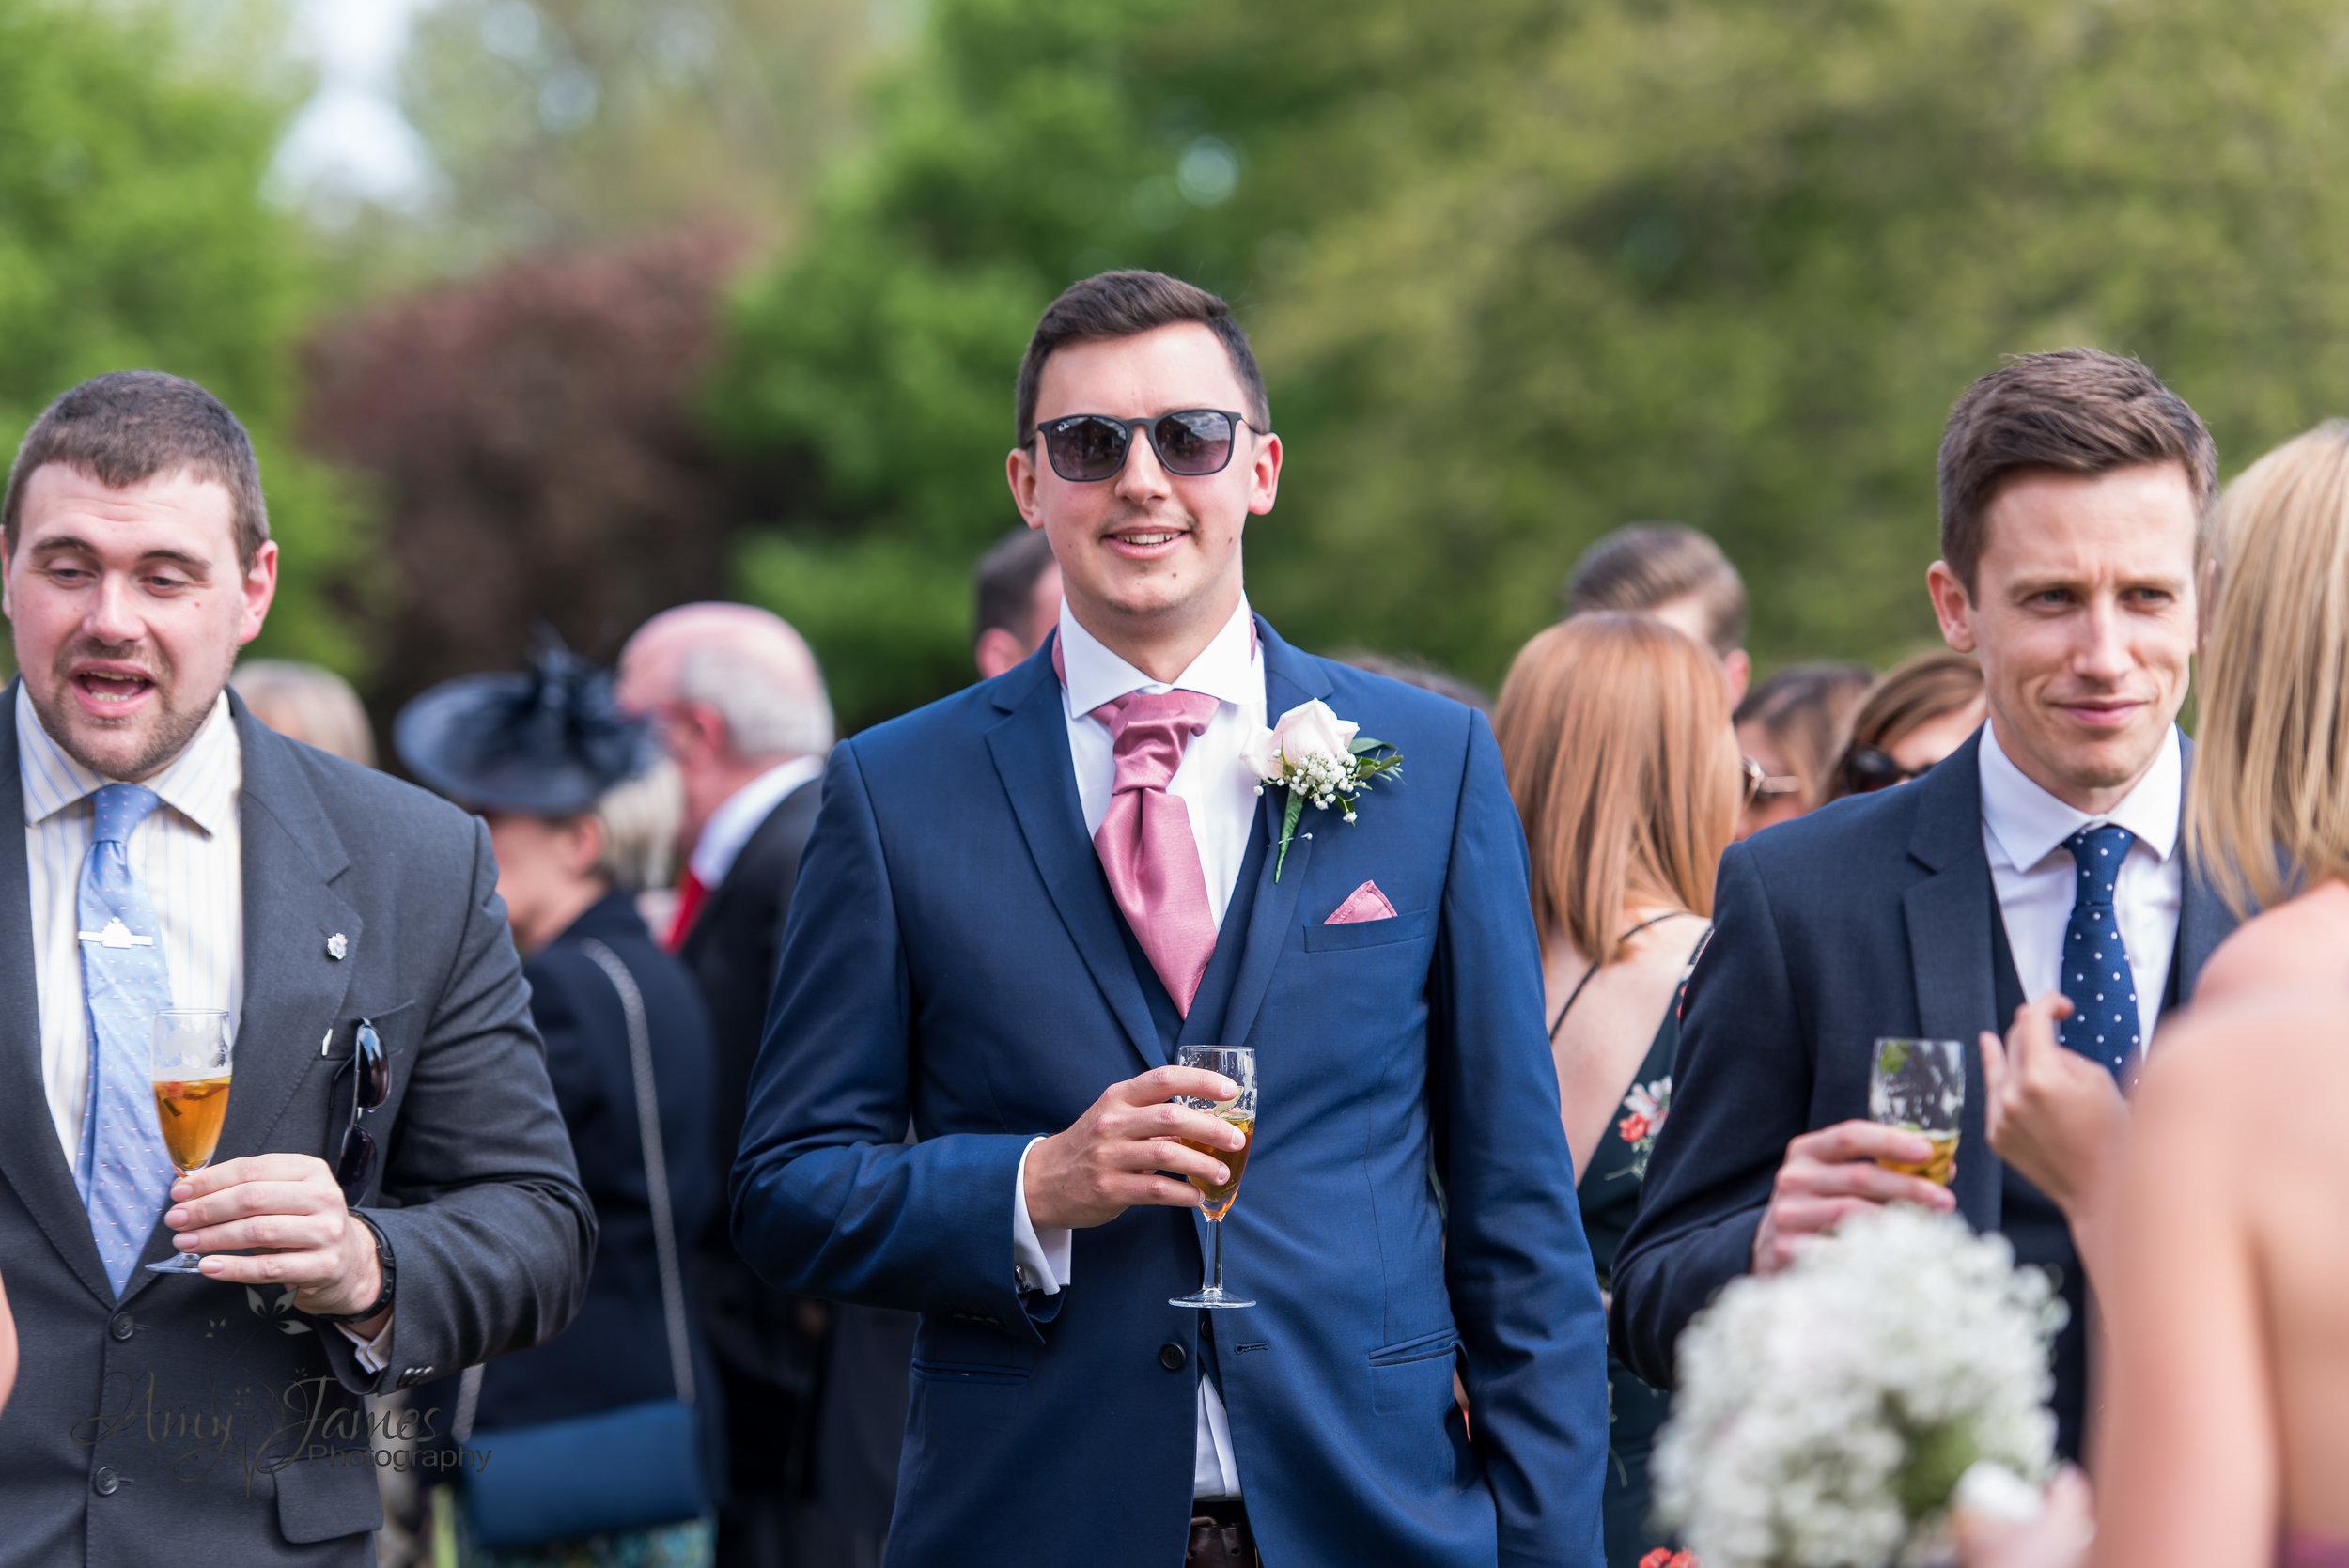 Highfiedl Park Hampshire Wedding Venue | Amy James Photography Fleet Wedding Photographer |